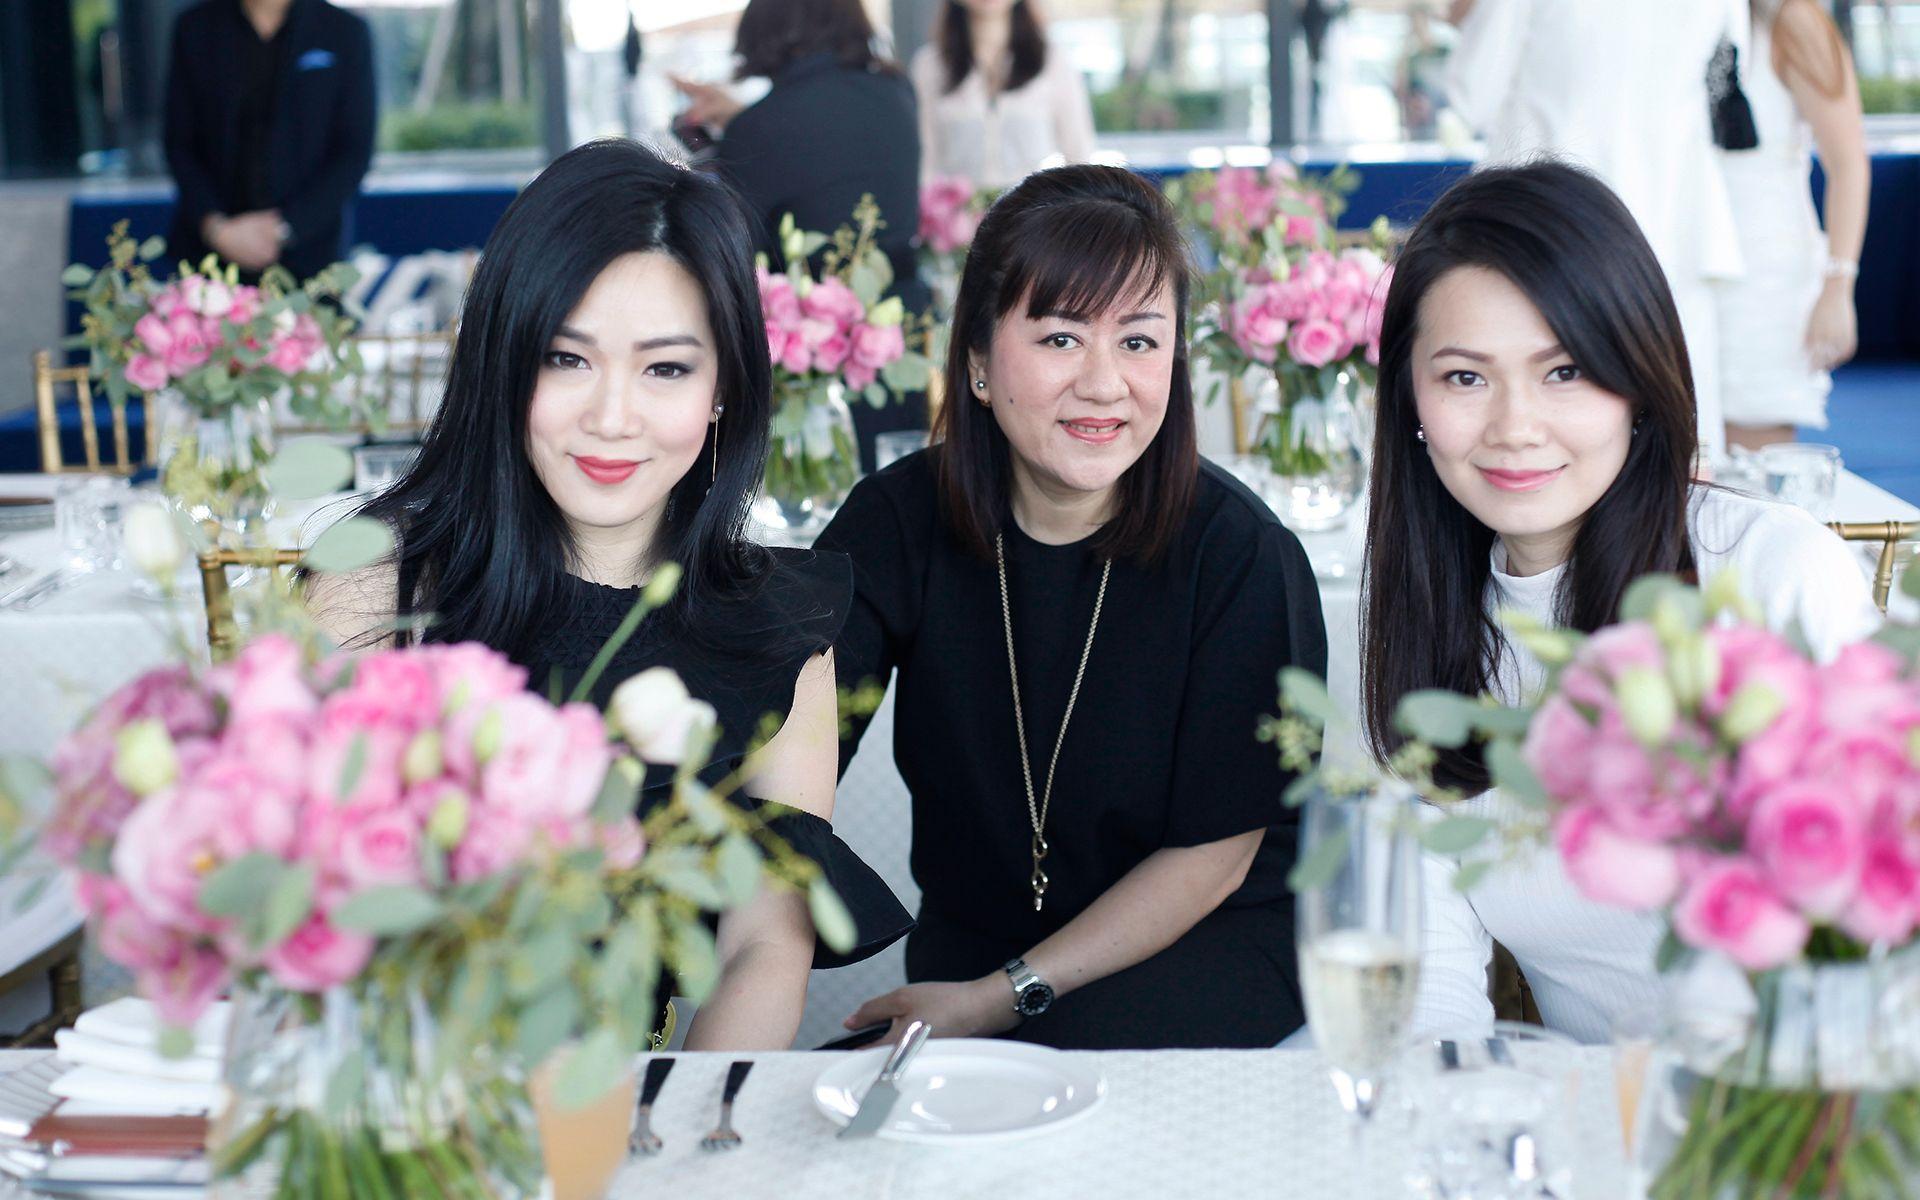 Shaine Wong, Angela Ong and Sunny Leong